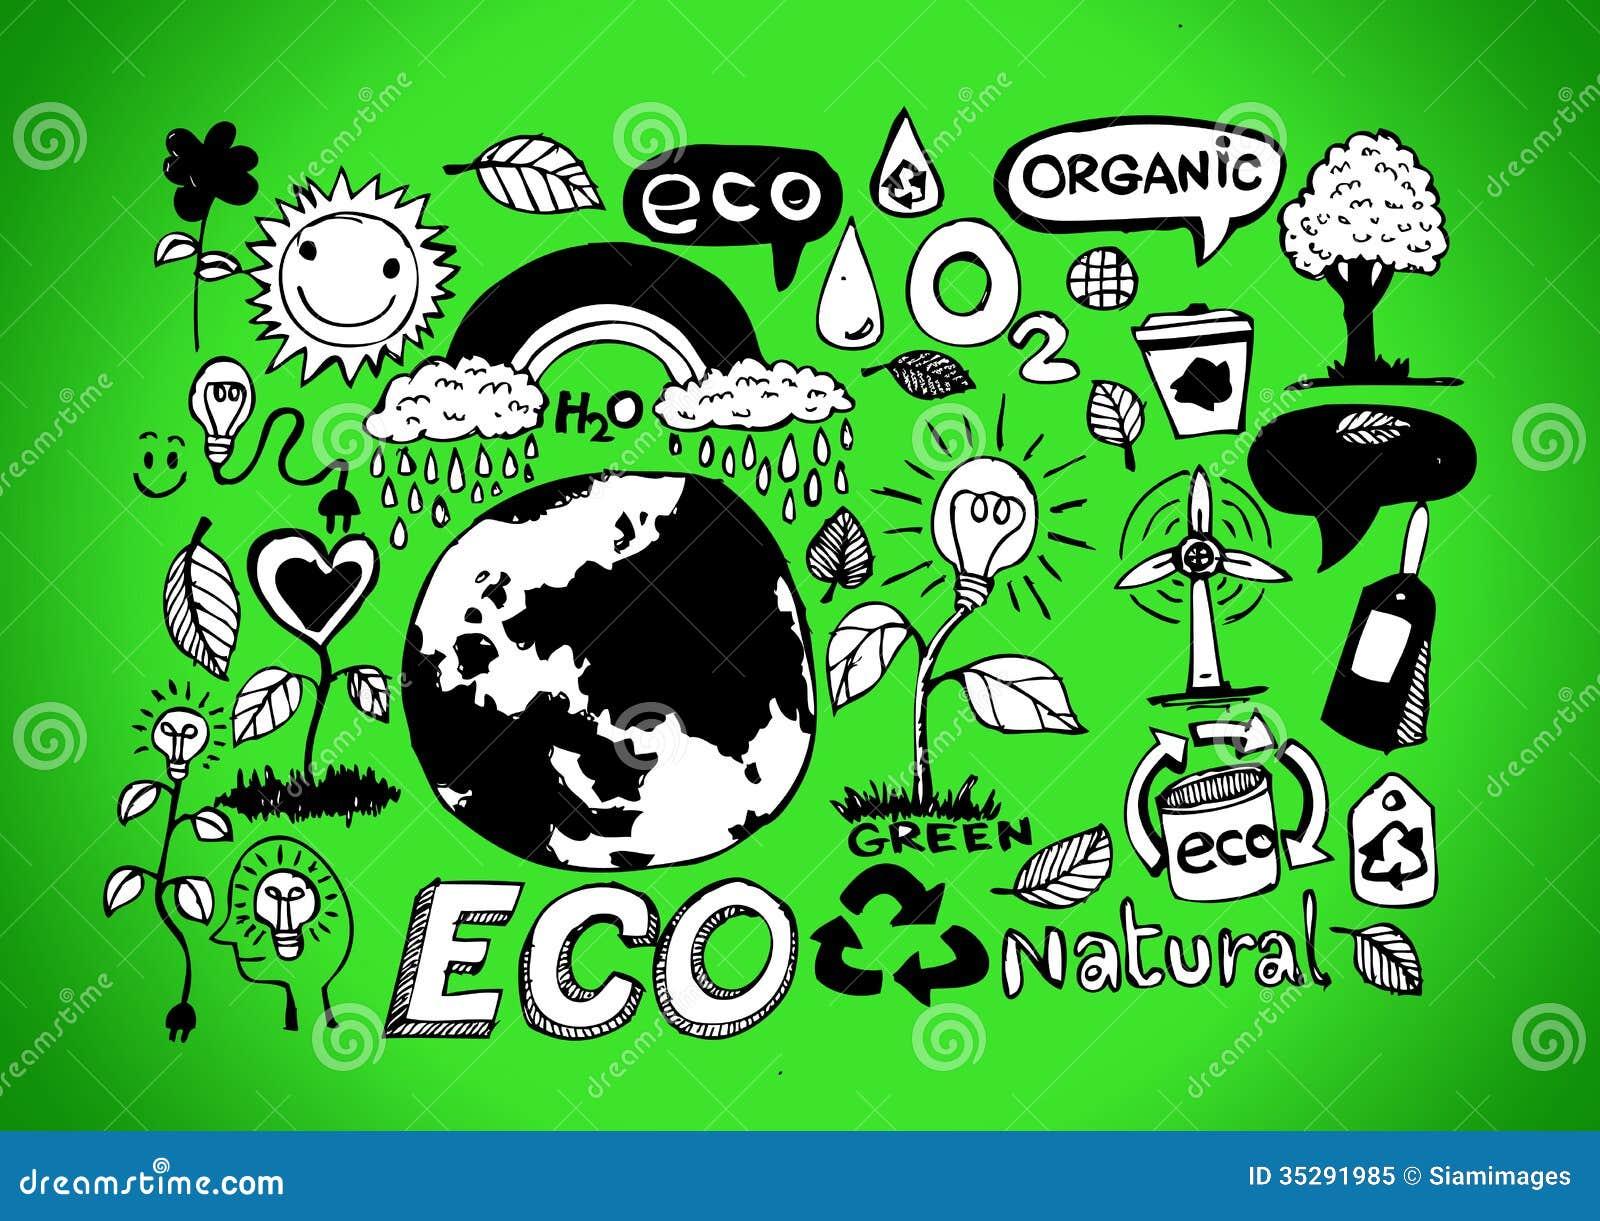 essay on eco friendly environment